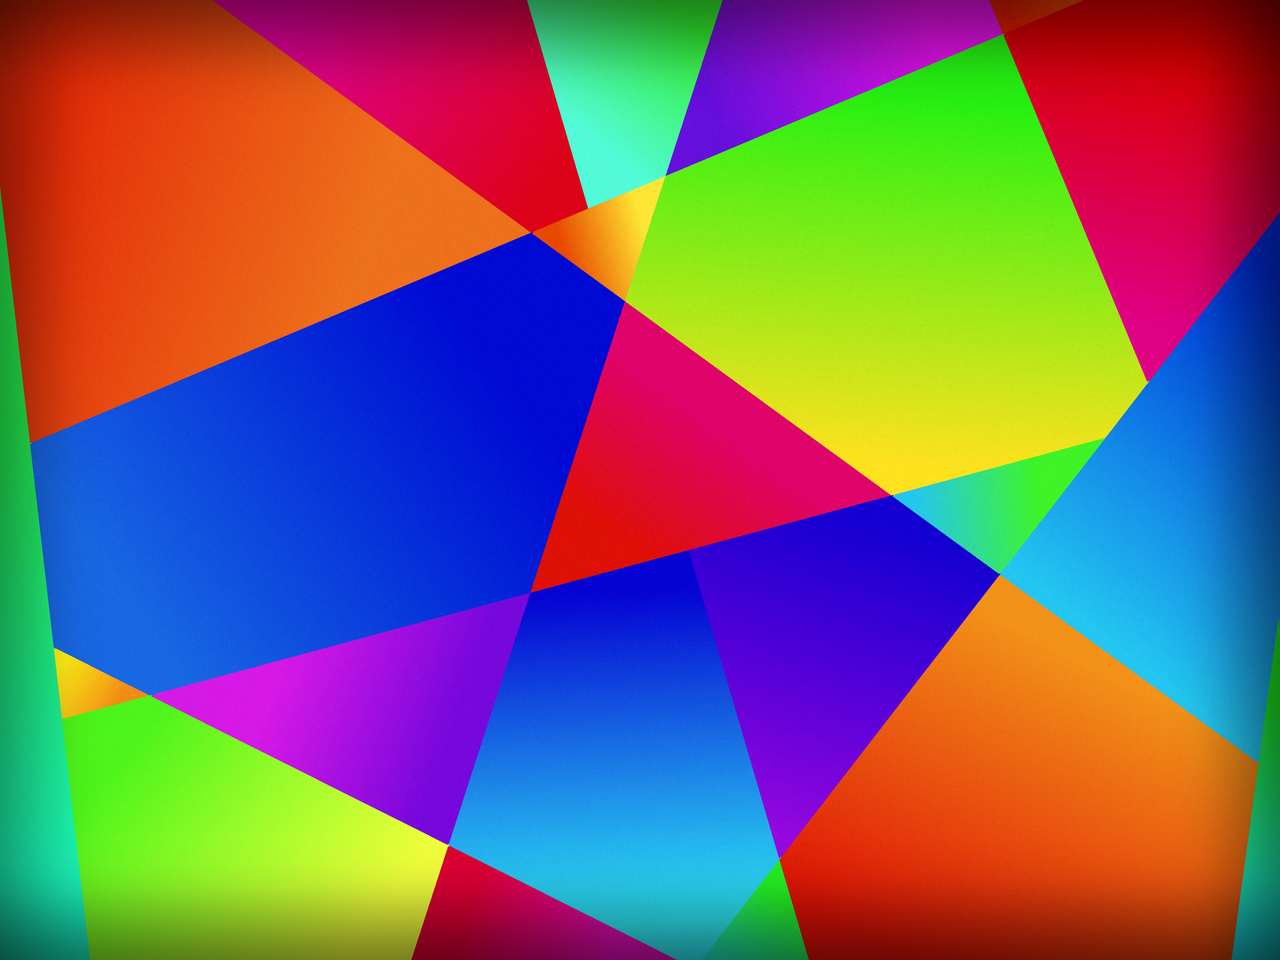 Colorful Polygon Wallpaper by mfoulks3200 on DeviantArt